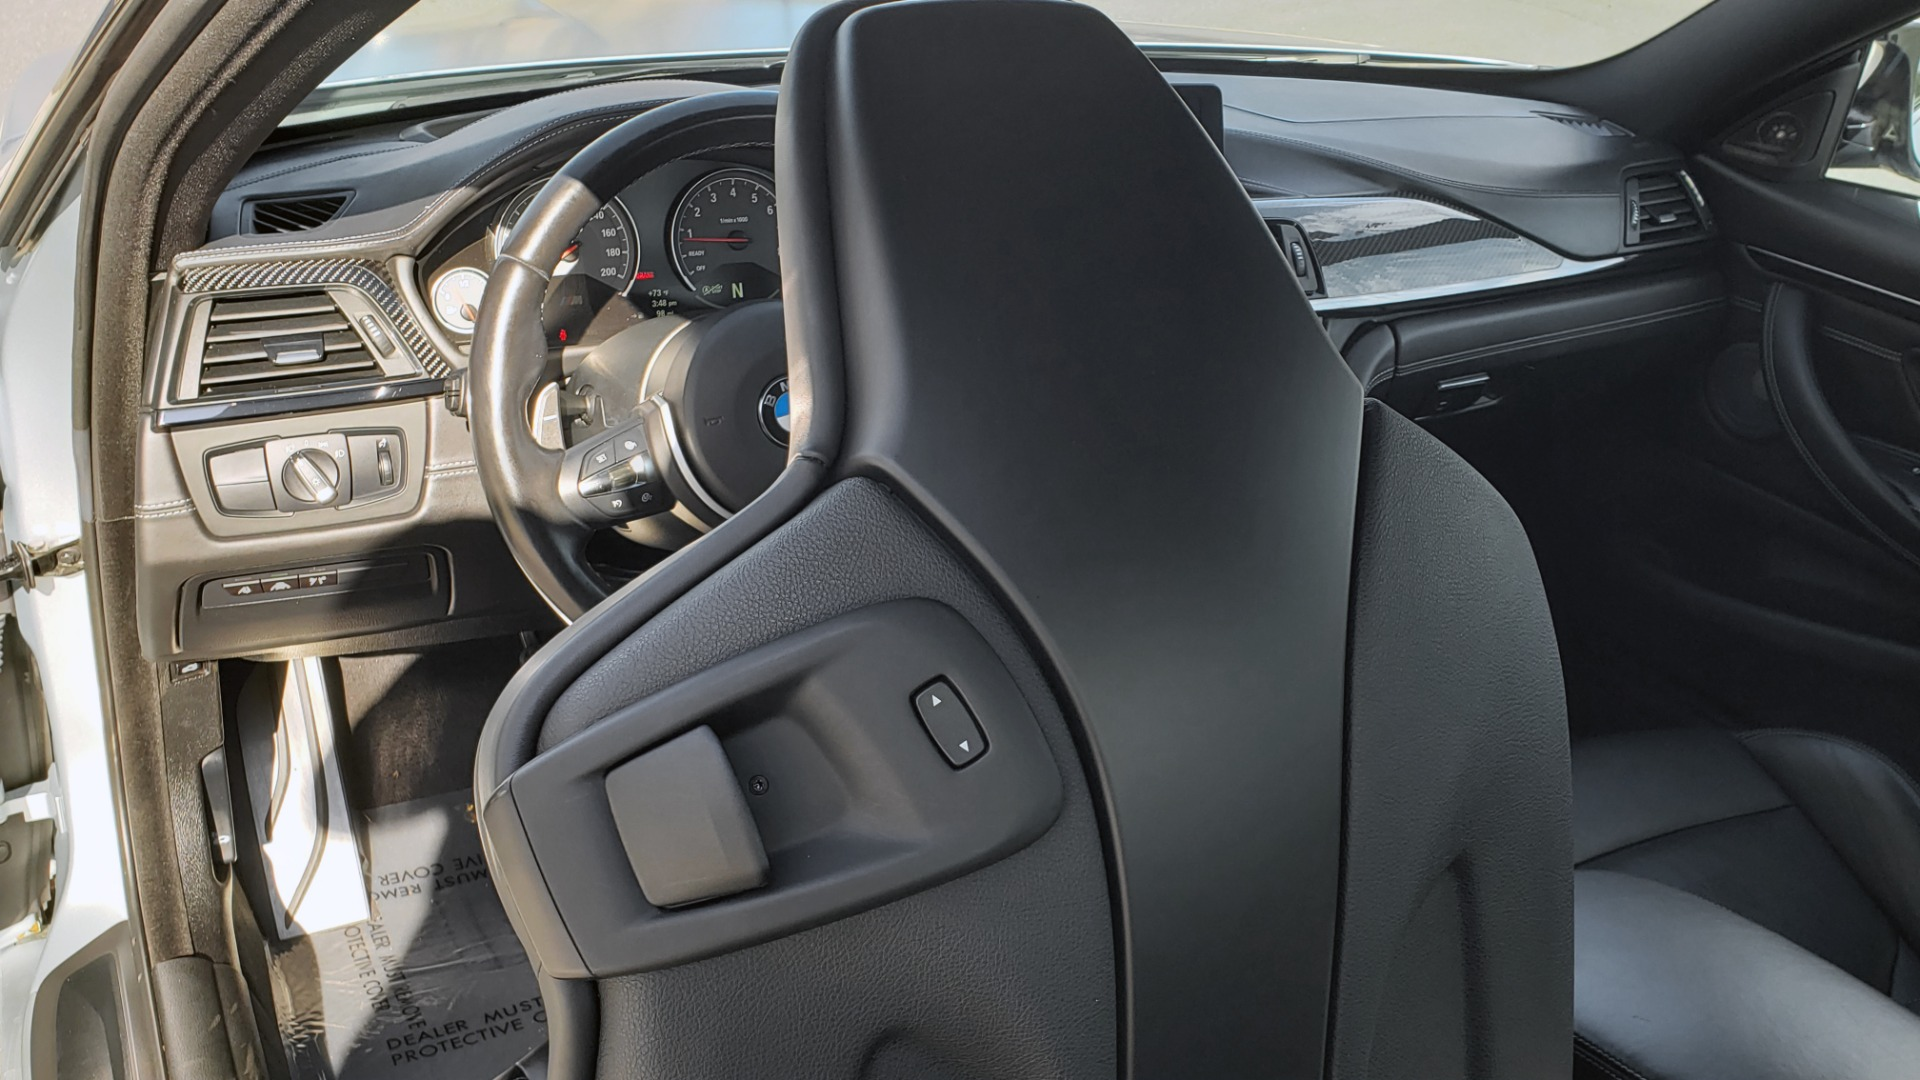 Used 2015 BMW M4 COUPE / EXEC PKG / DRVR ASST PLUS / LIGHTING / M-SUSPENSION for sale Sold at Formula Imports in Charlotte NC 28227 67